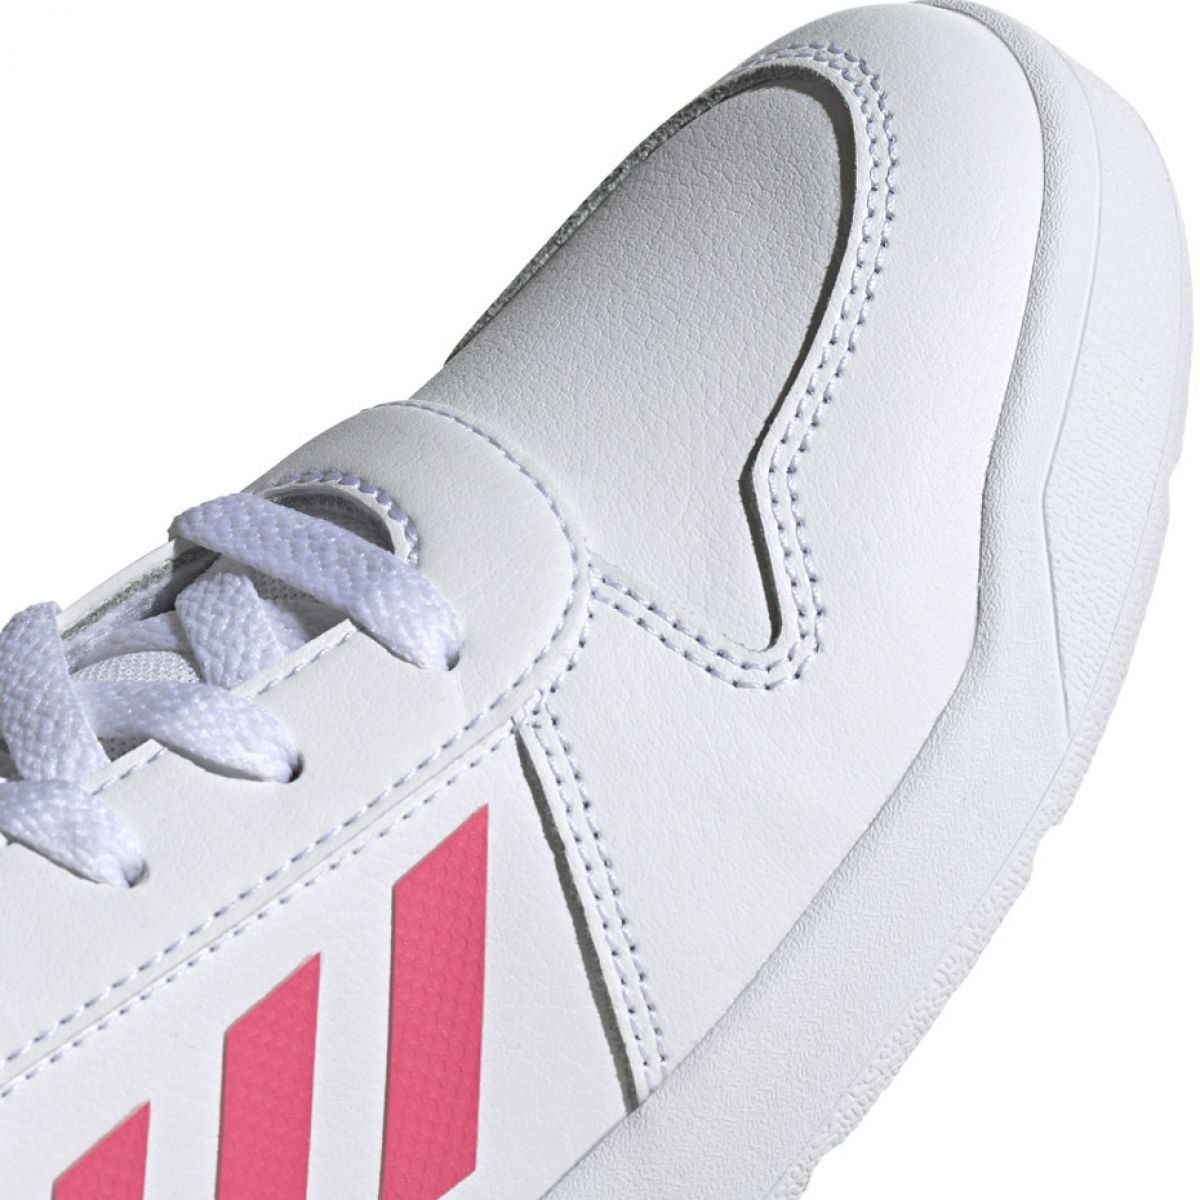 Buty Adidas Tensaur K Jr Ef1088 Biale Shoes Kid Shoes Sports Shoes Adidas